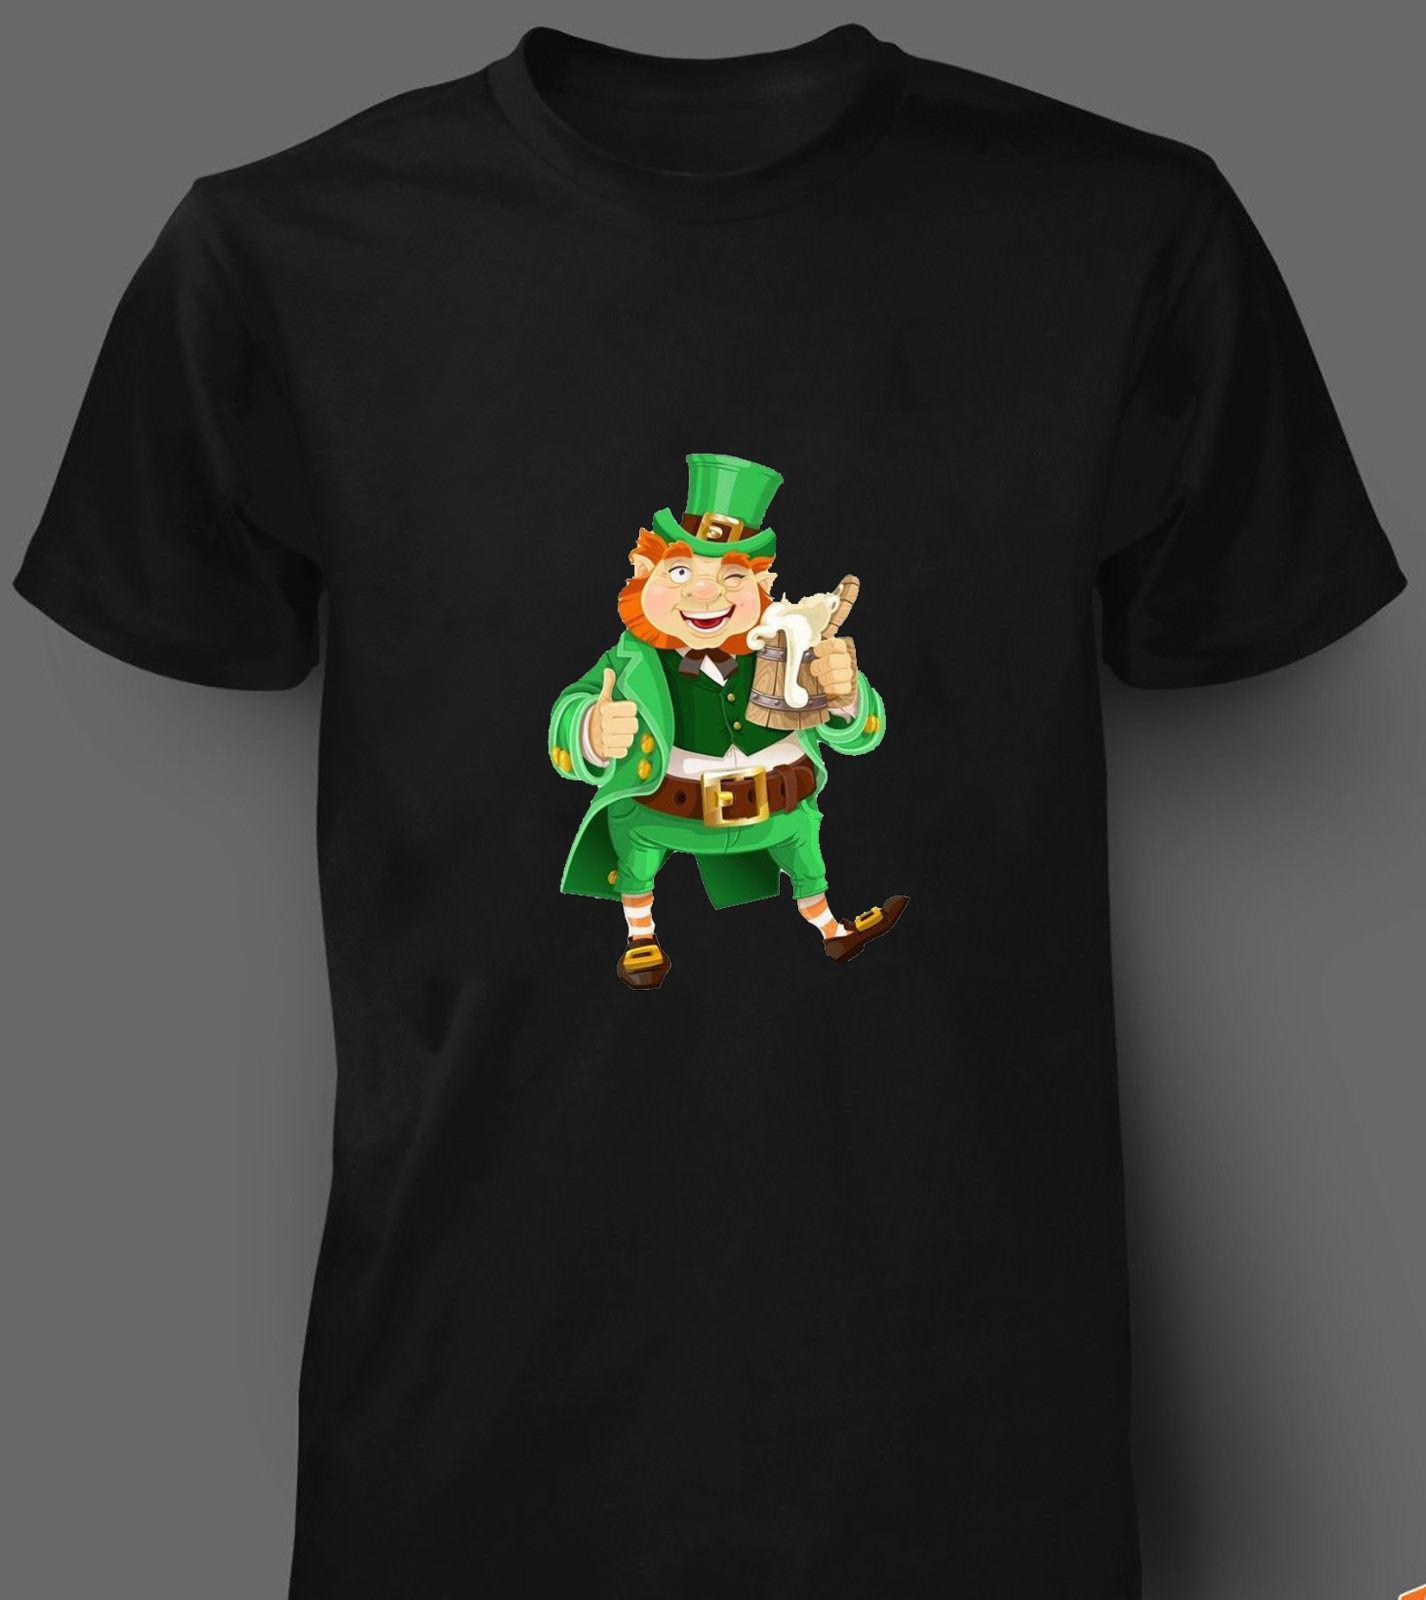 8621c028f St Patricks Day T Shirt Leprechaun Ireland Shamrock Paddys Day Men Women  Kids Funny Unisex Casual Tshirt Top Crazy T Shirts Online Cool Looking T  Shirts ...